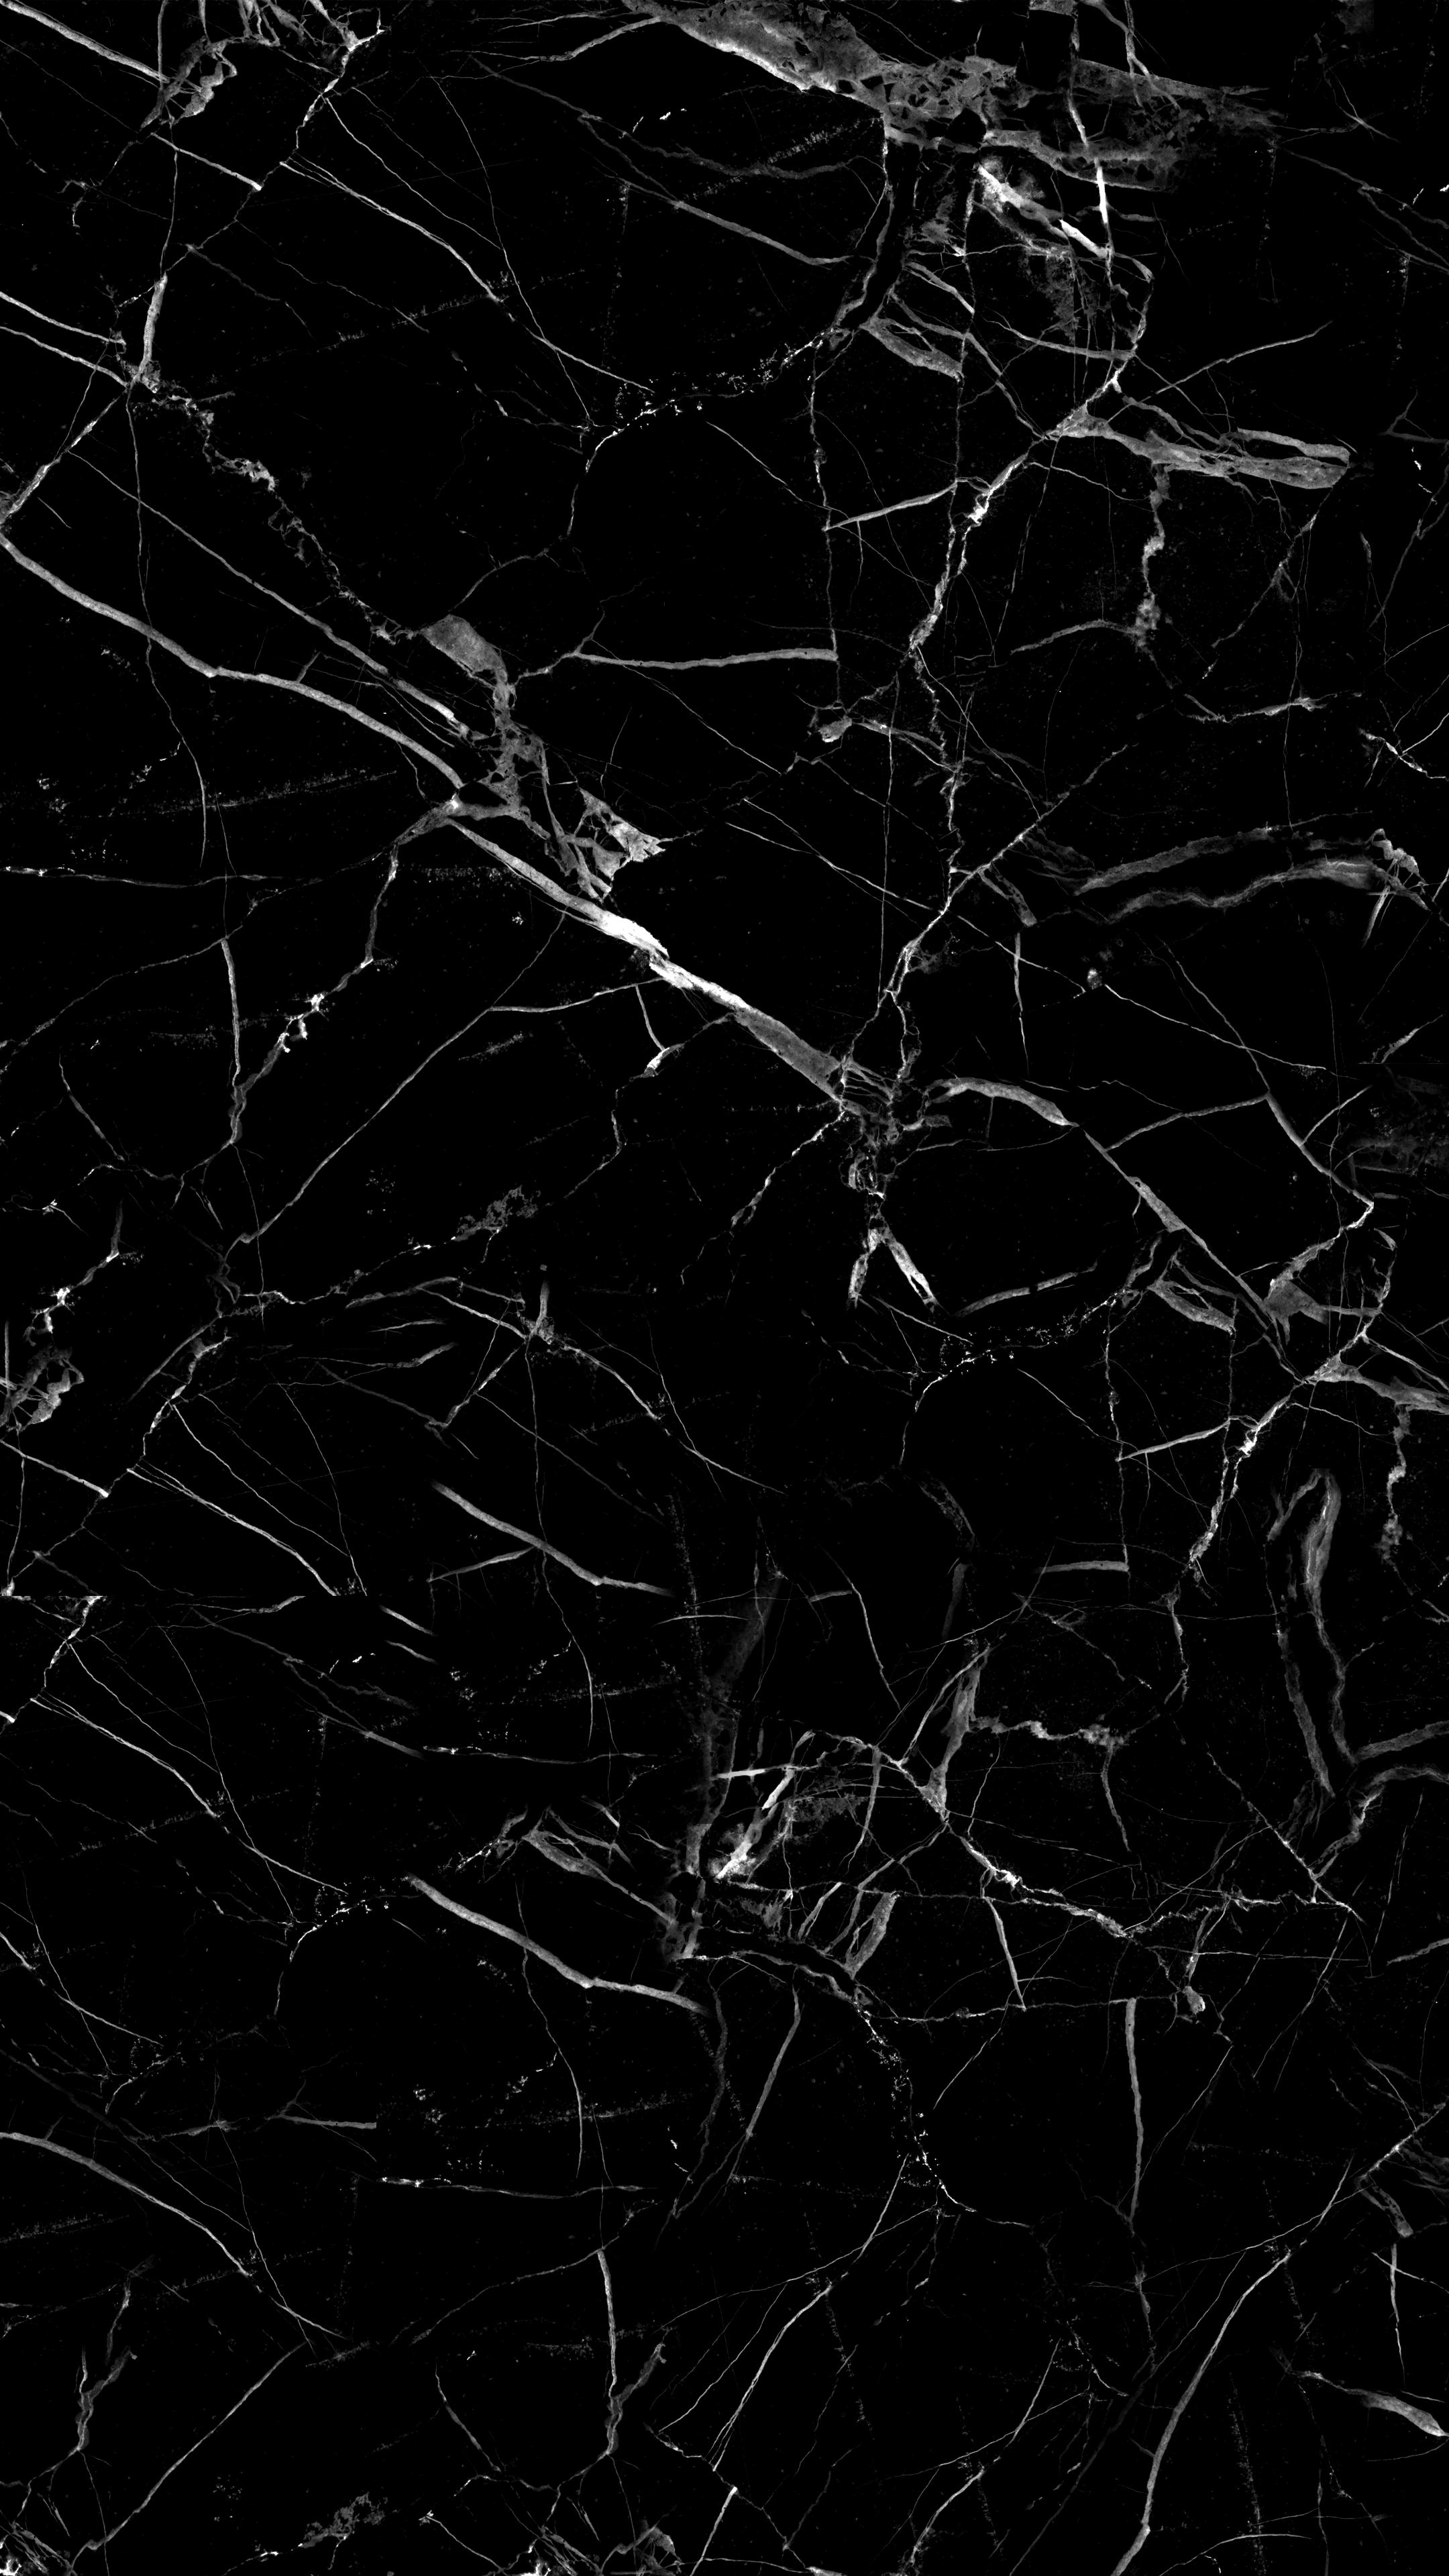 25 Black Marble Wallpapers On Wallpapersafari